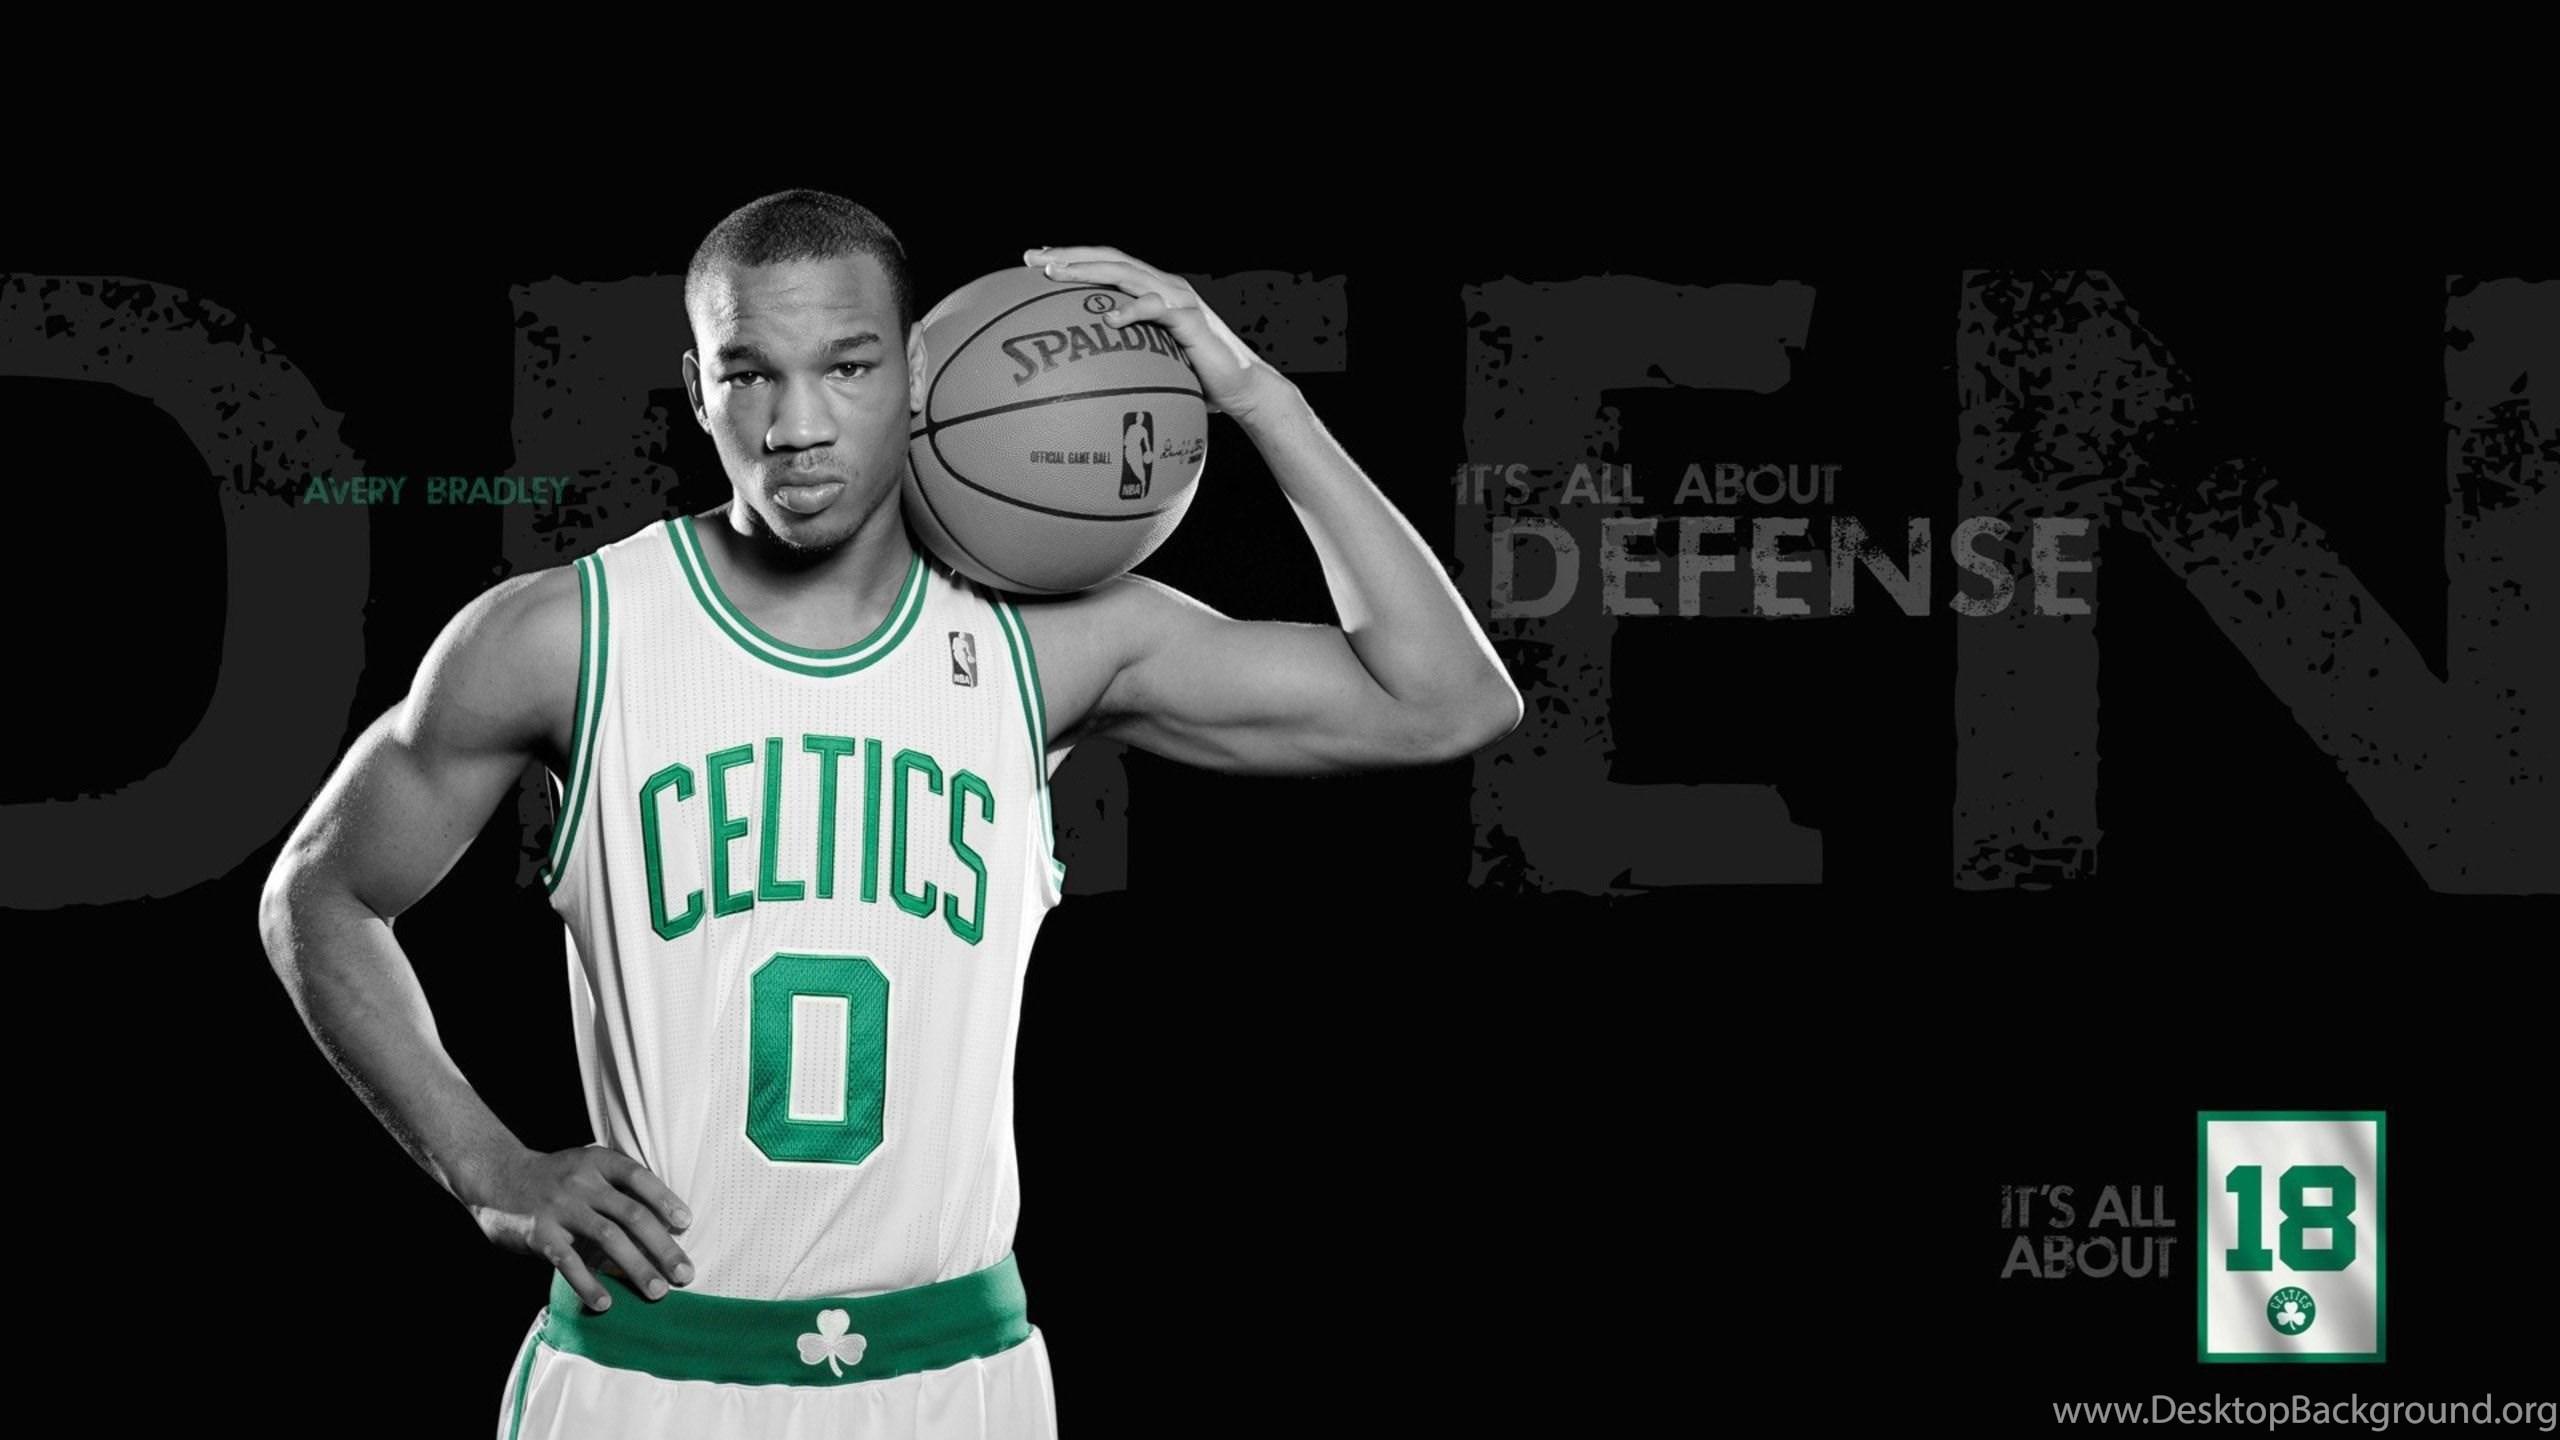 Avery bradley basketball nba boston celtics hd wallpapers new hd netbook voltagebd Choice Image